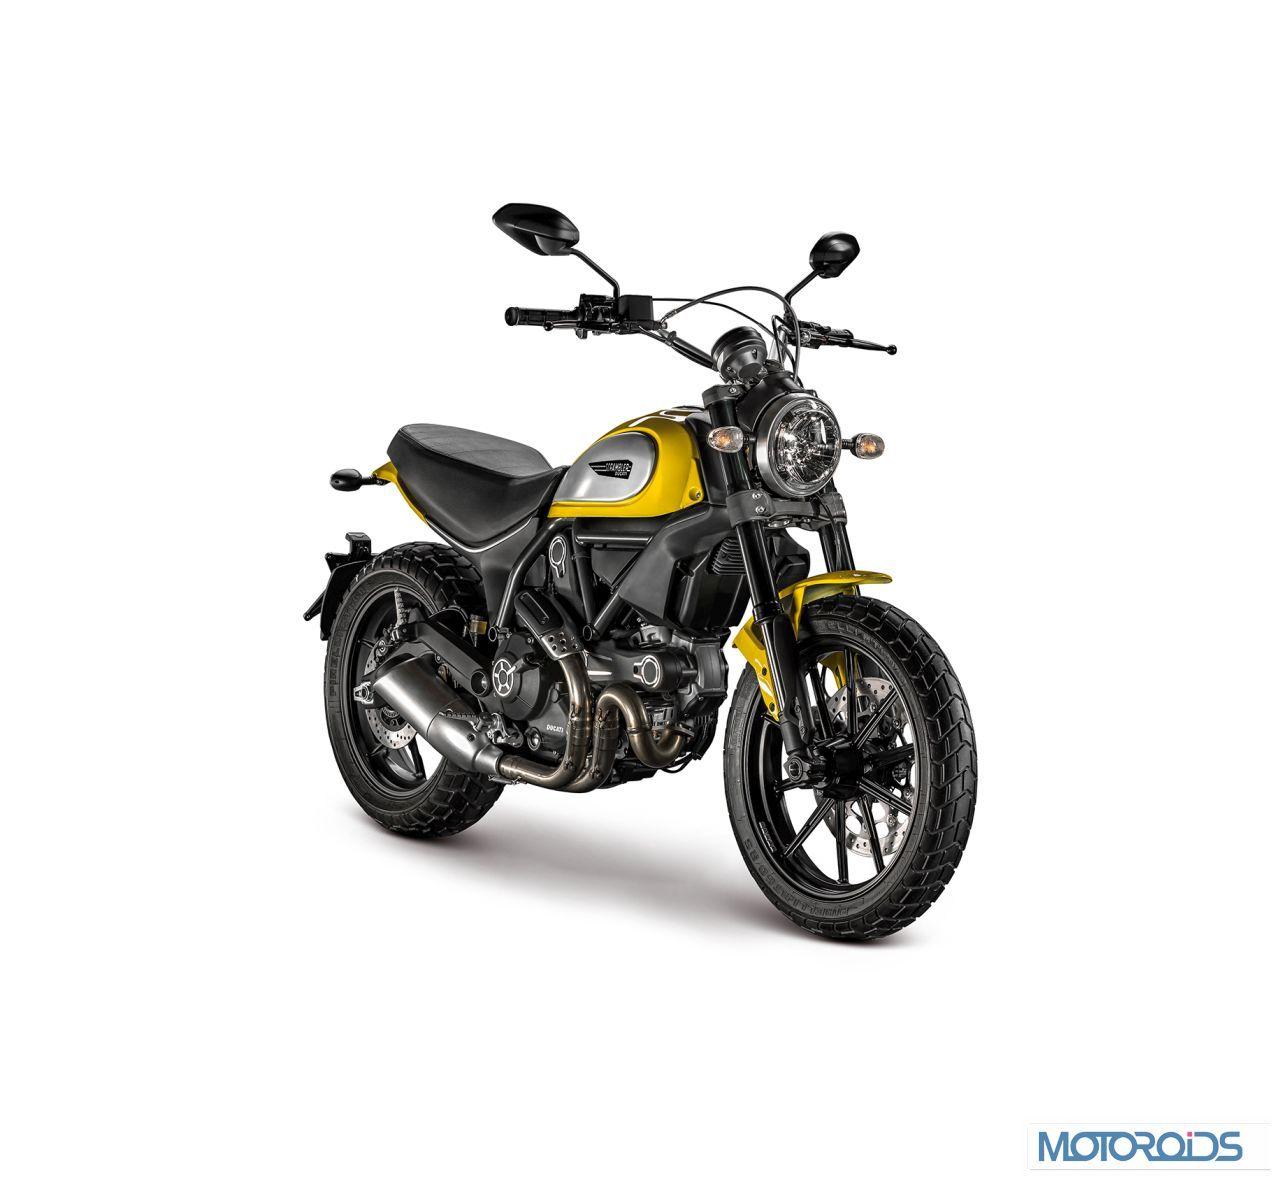 Upcoming Motorcycles 2015 - Ducati Scrambler (1)